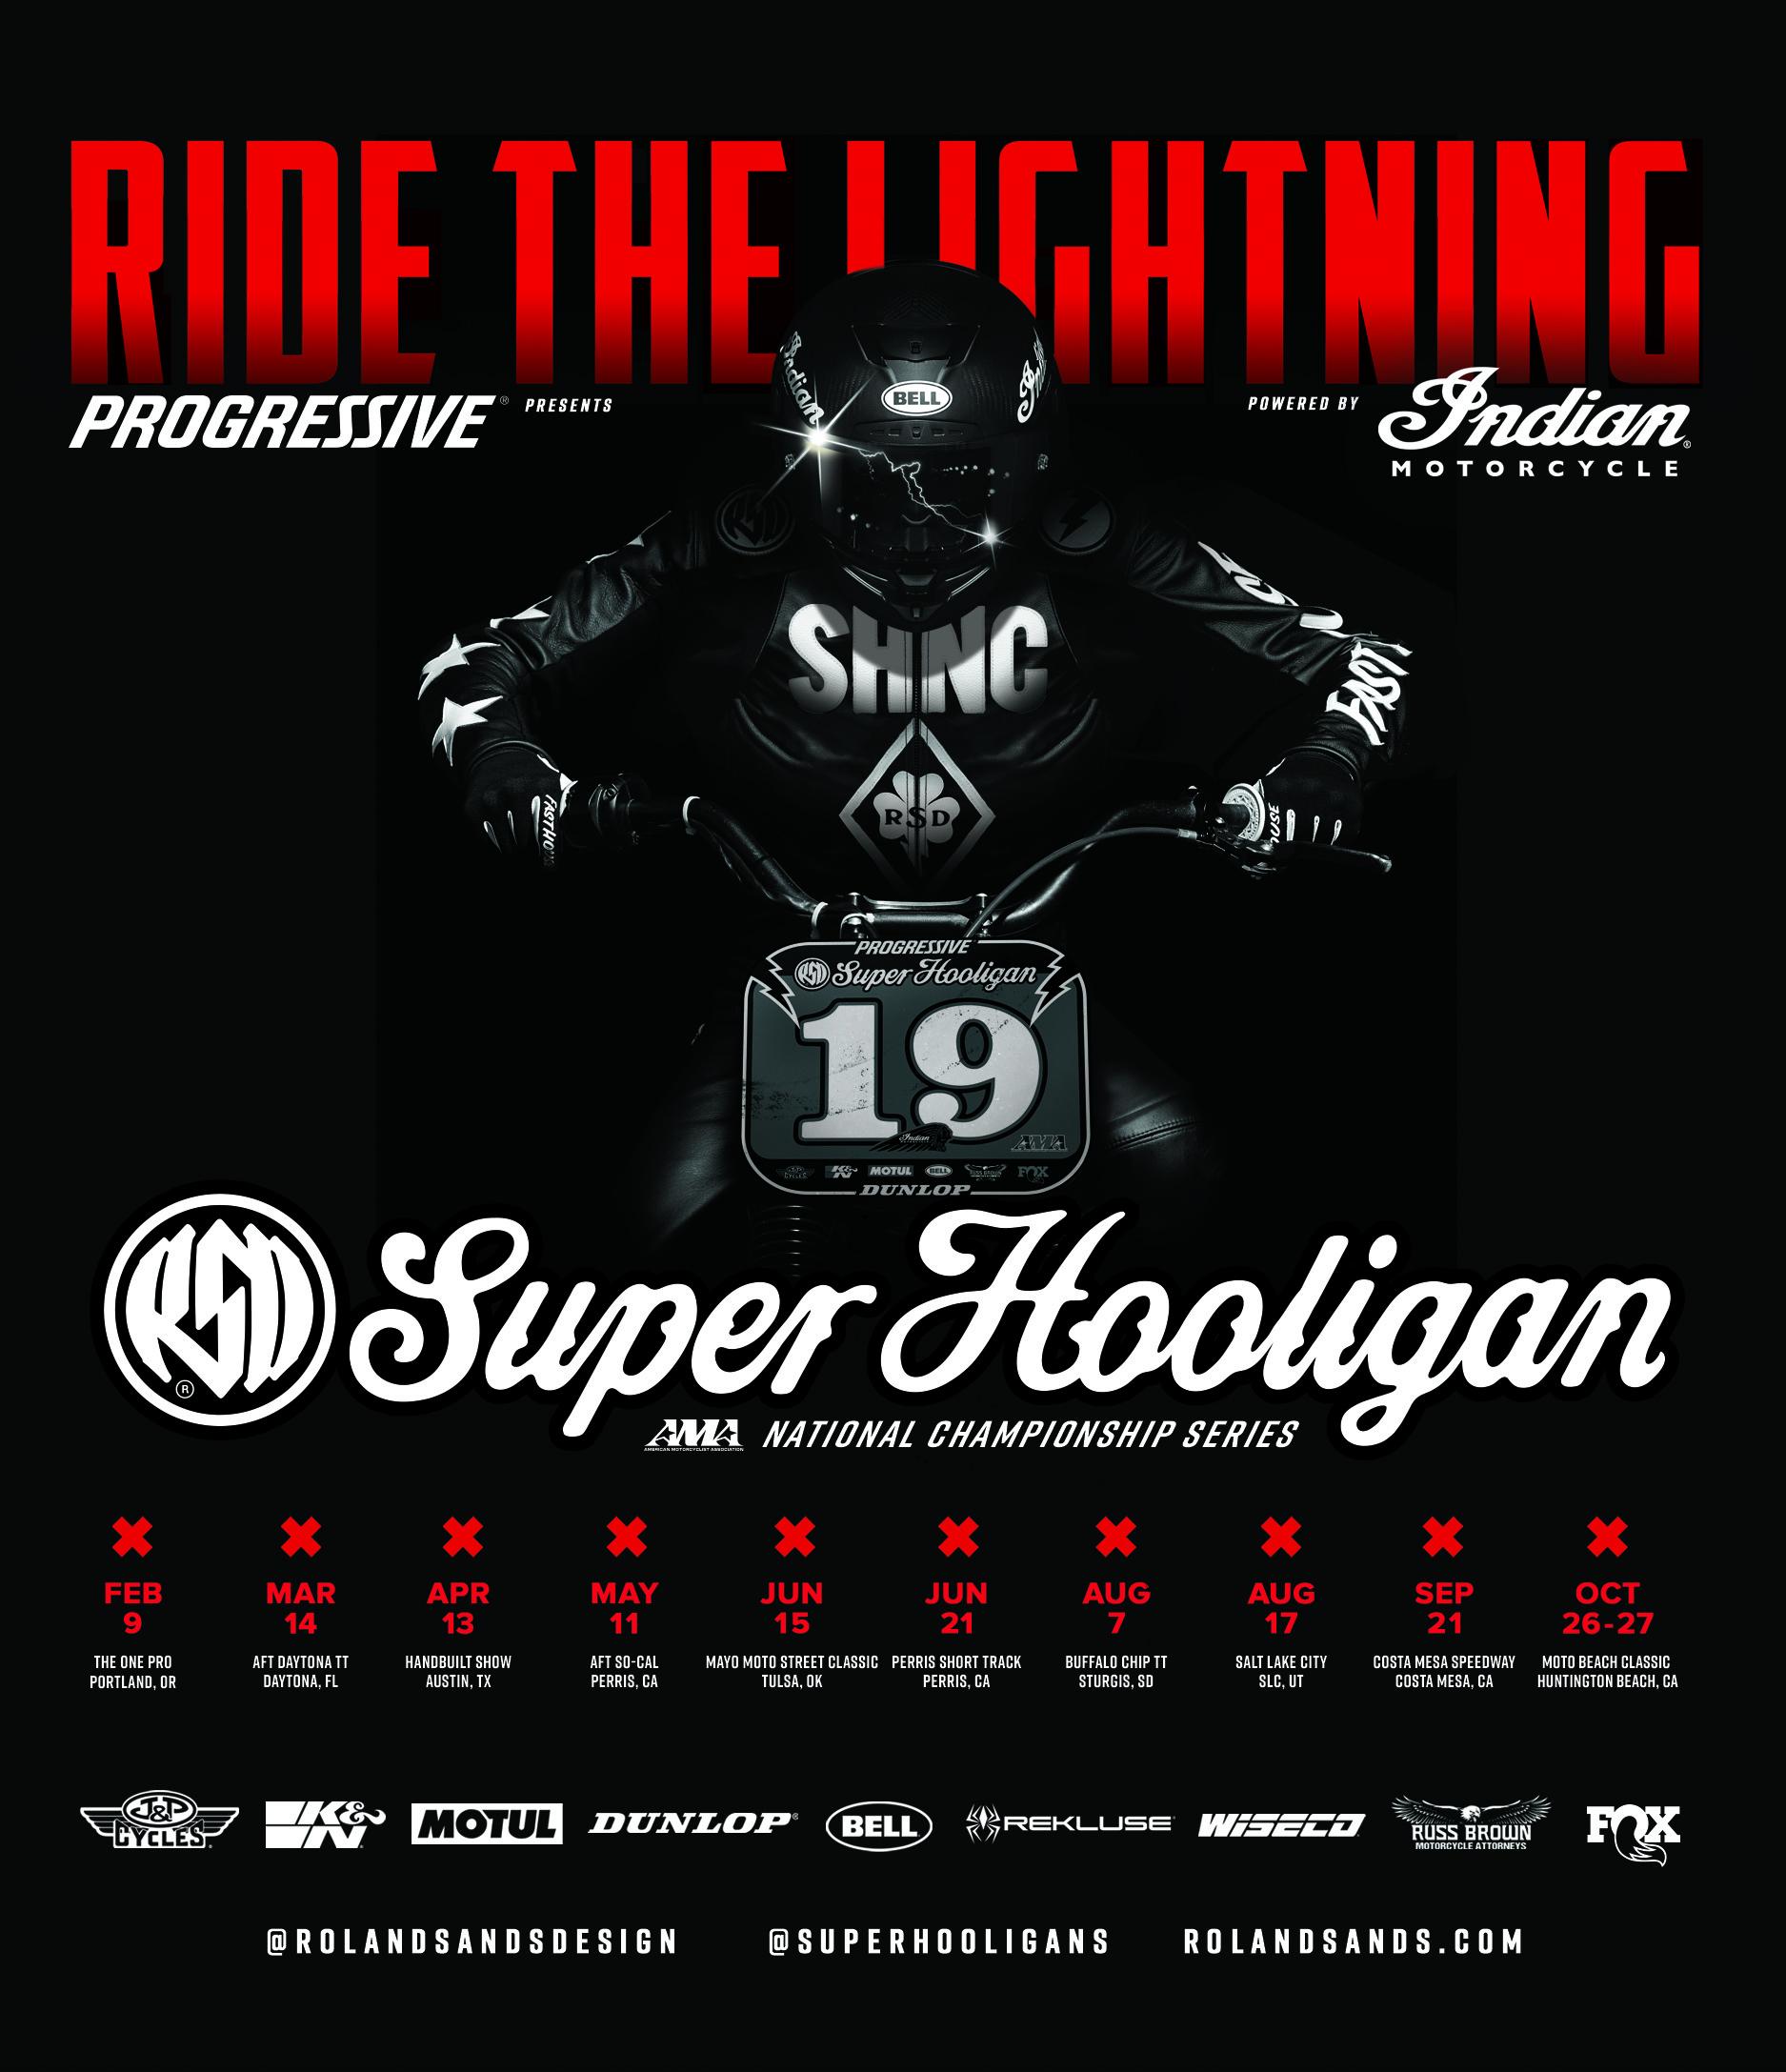 Super Hooligan National Championship Series steams towards